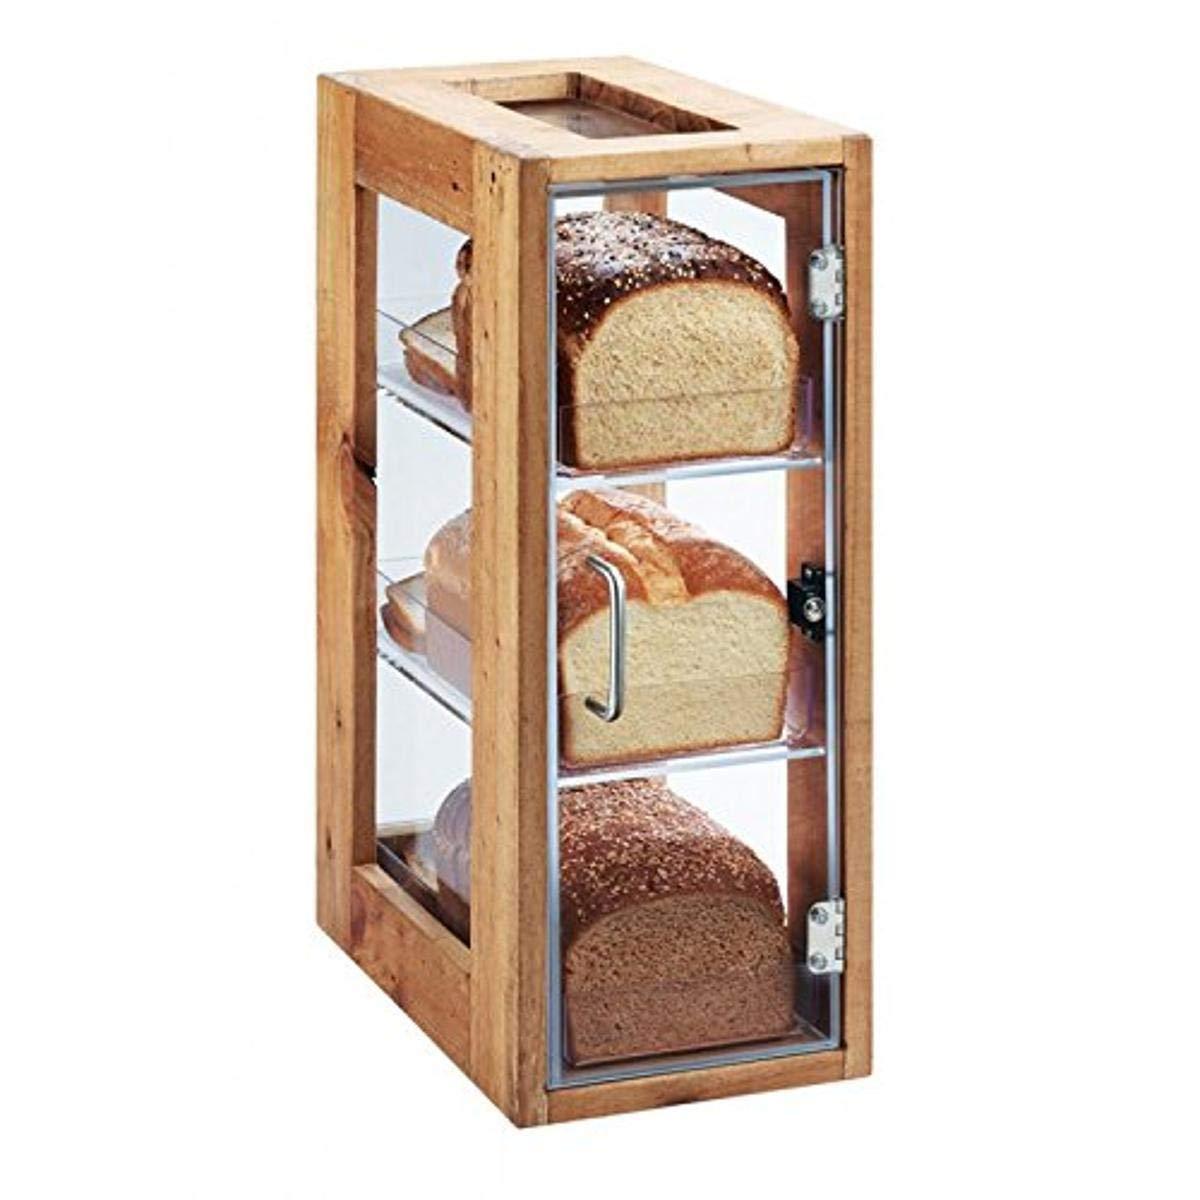 Cal-Mil 1204-99 Bread Display 20.5